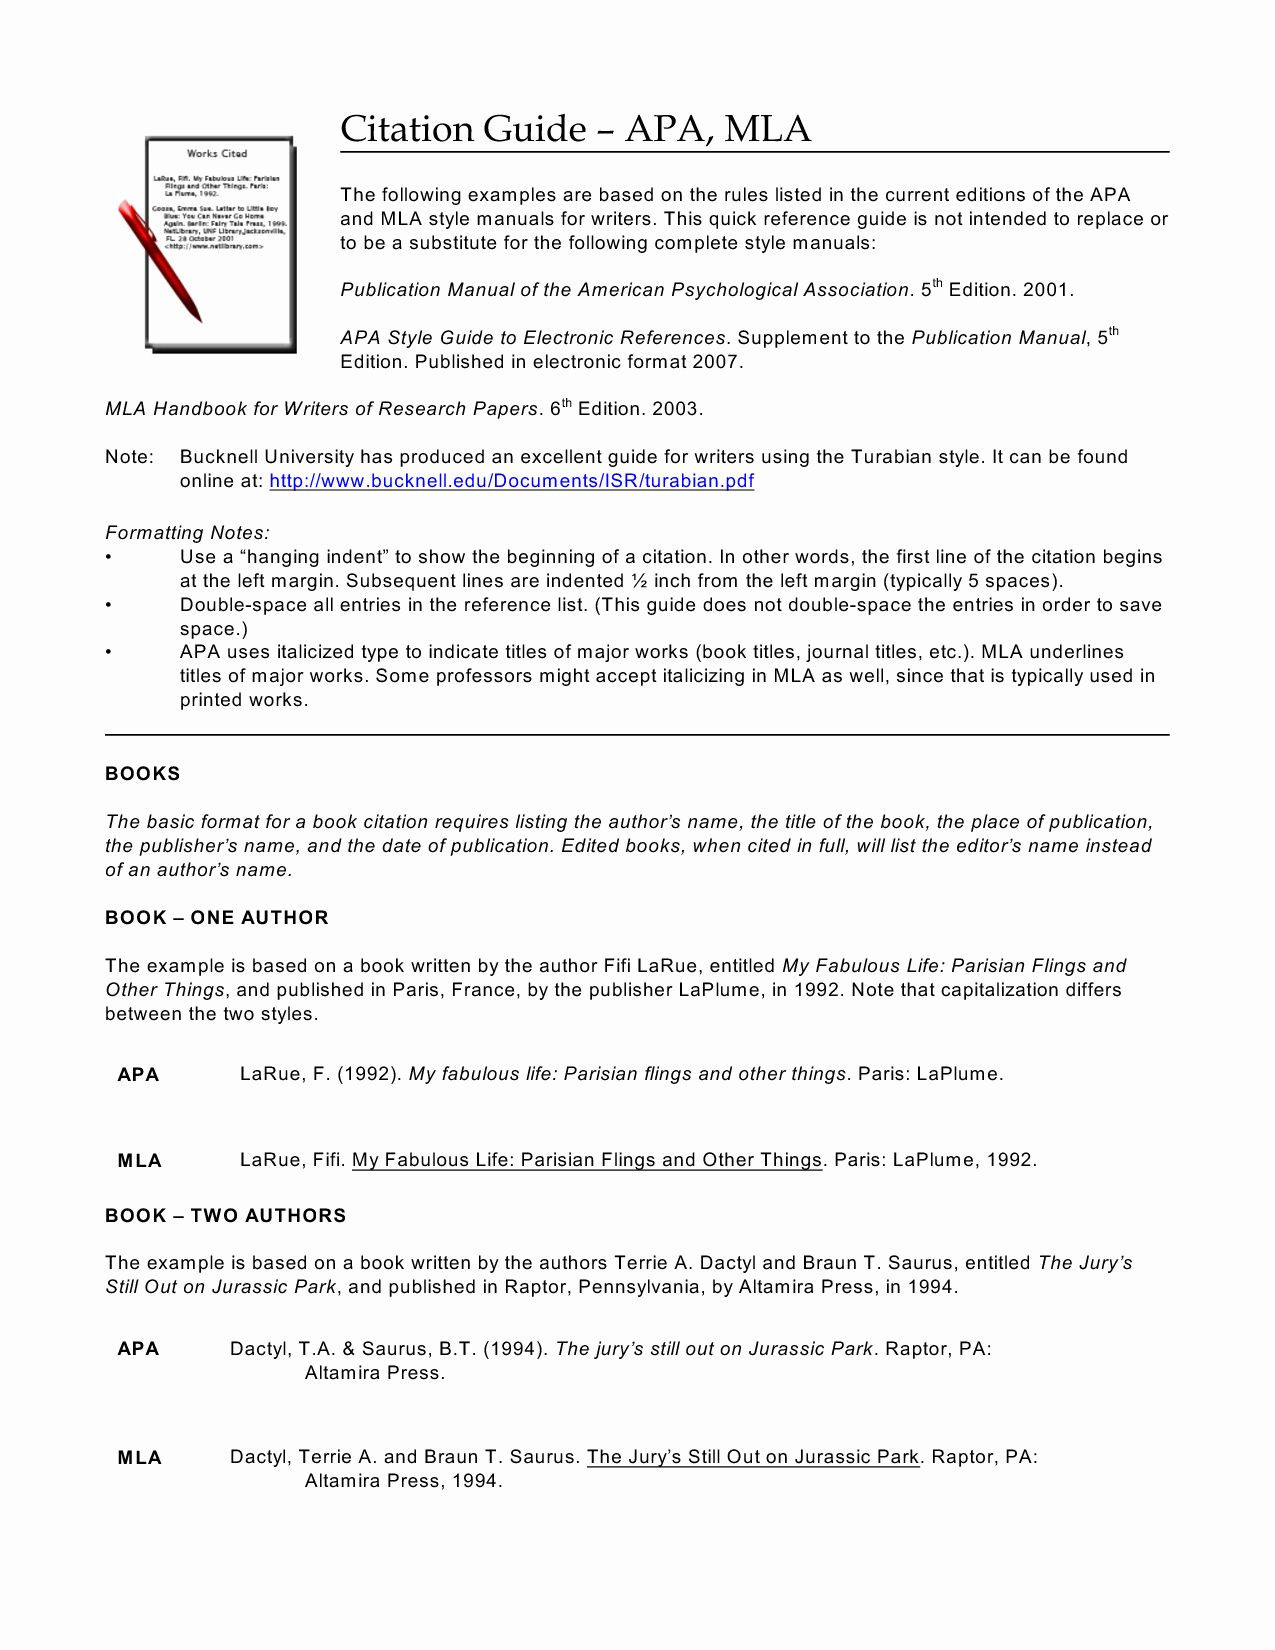 Mla Citation Practice Worksheet 50 Mla Citation Practice Worksheet In 2020